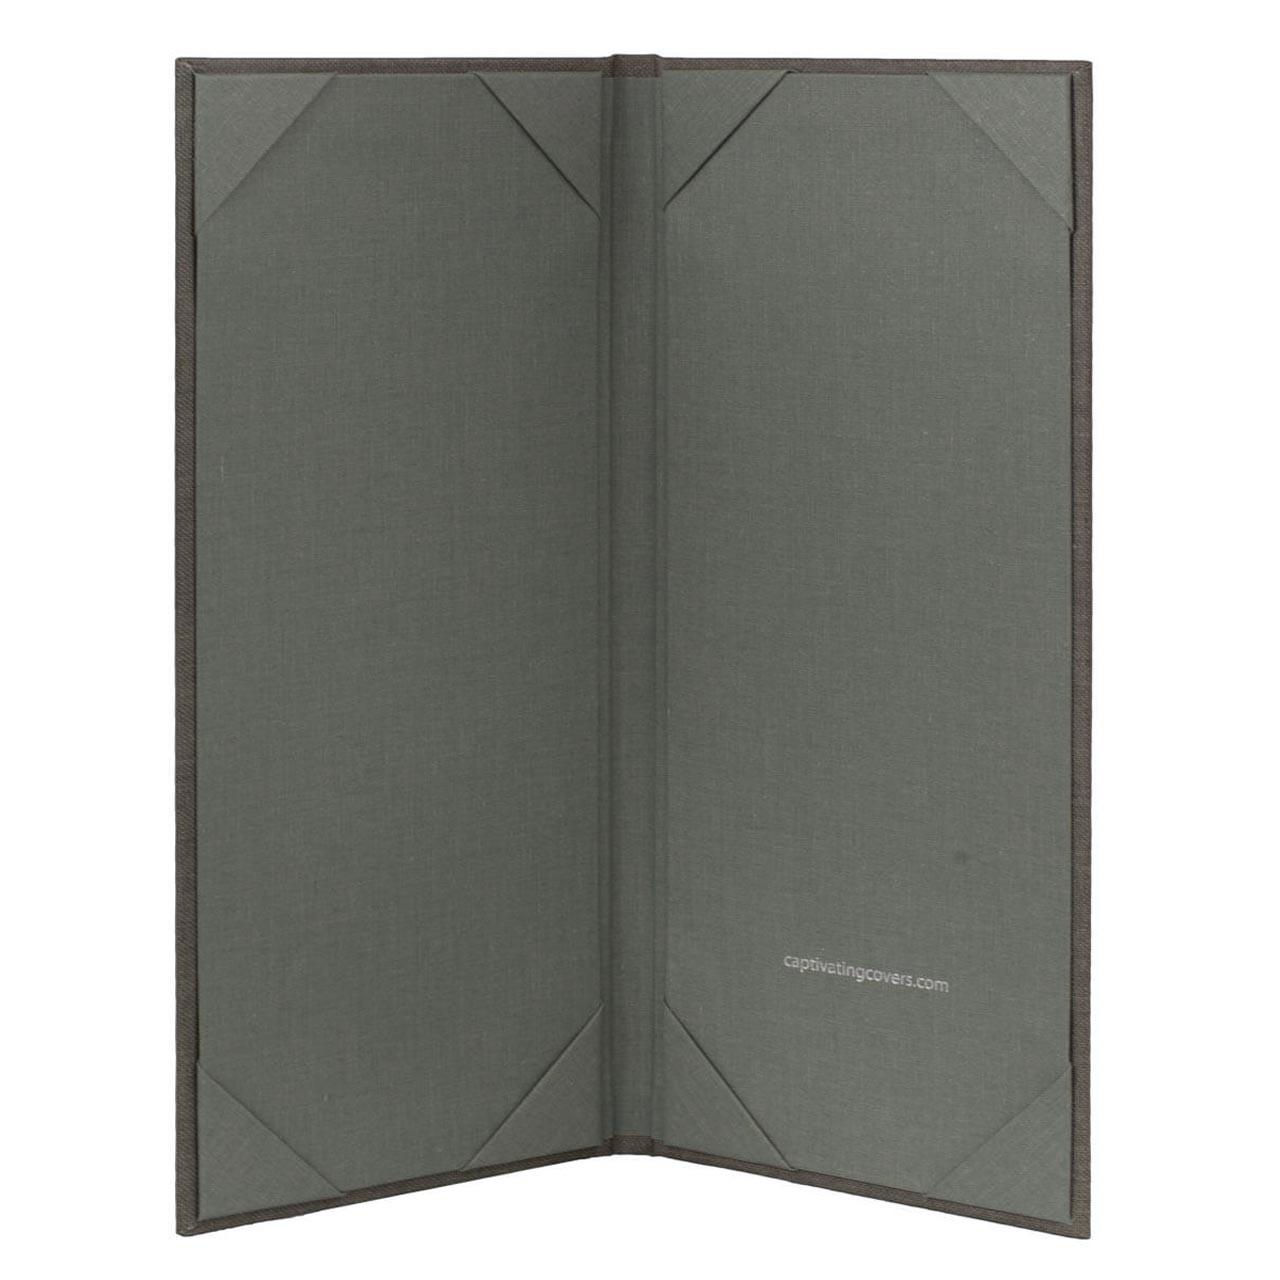 Menu Cover (Gray) 4.25 in. x 11 in. Insert, 2-Panel  (inside)